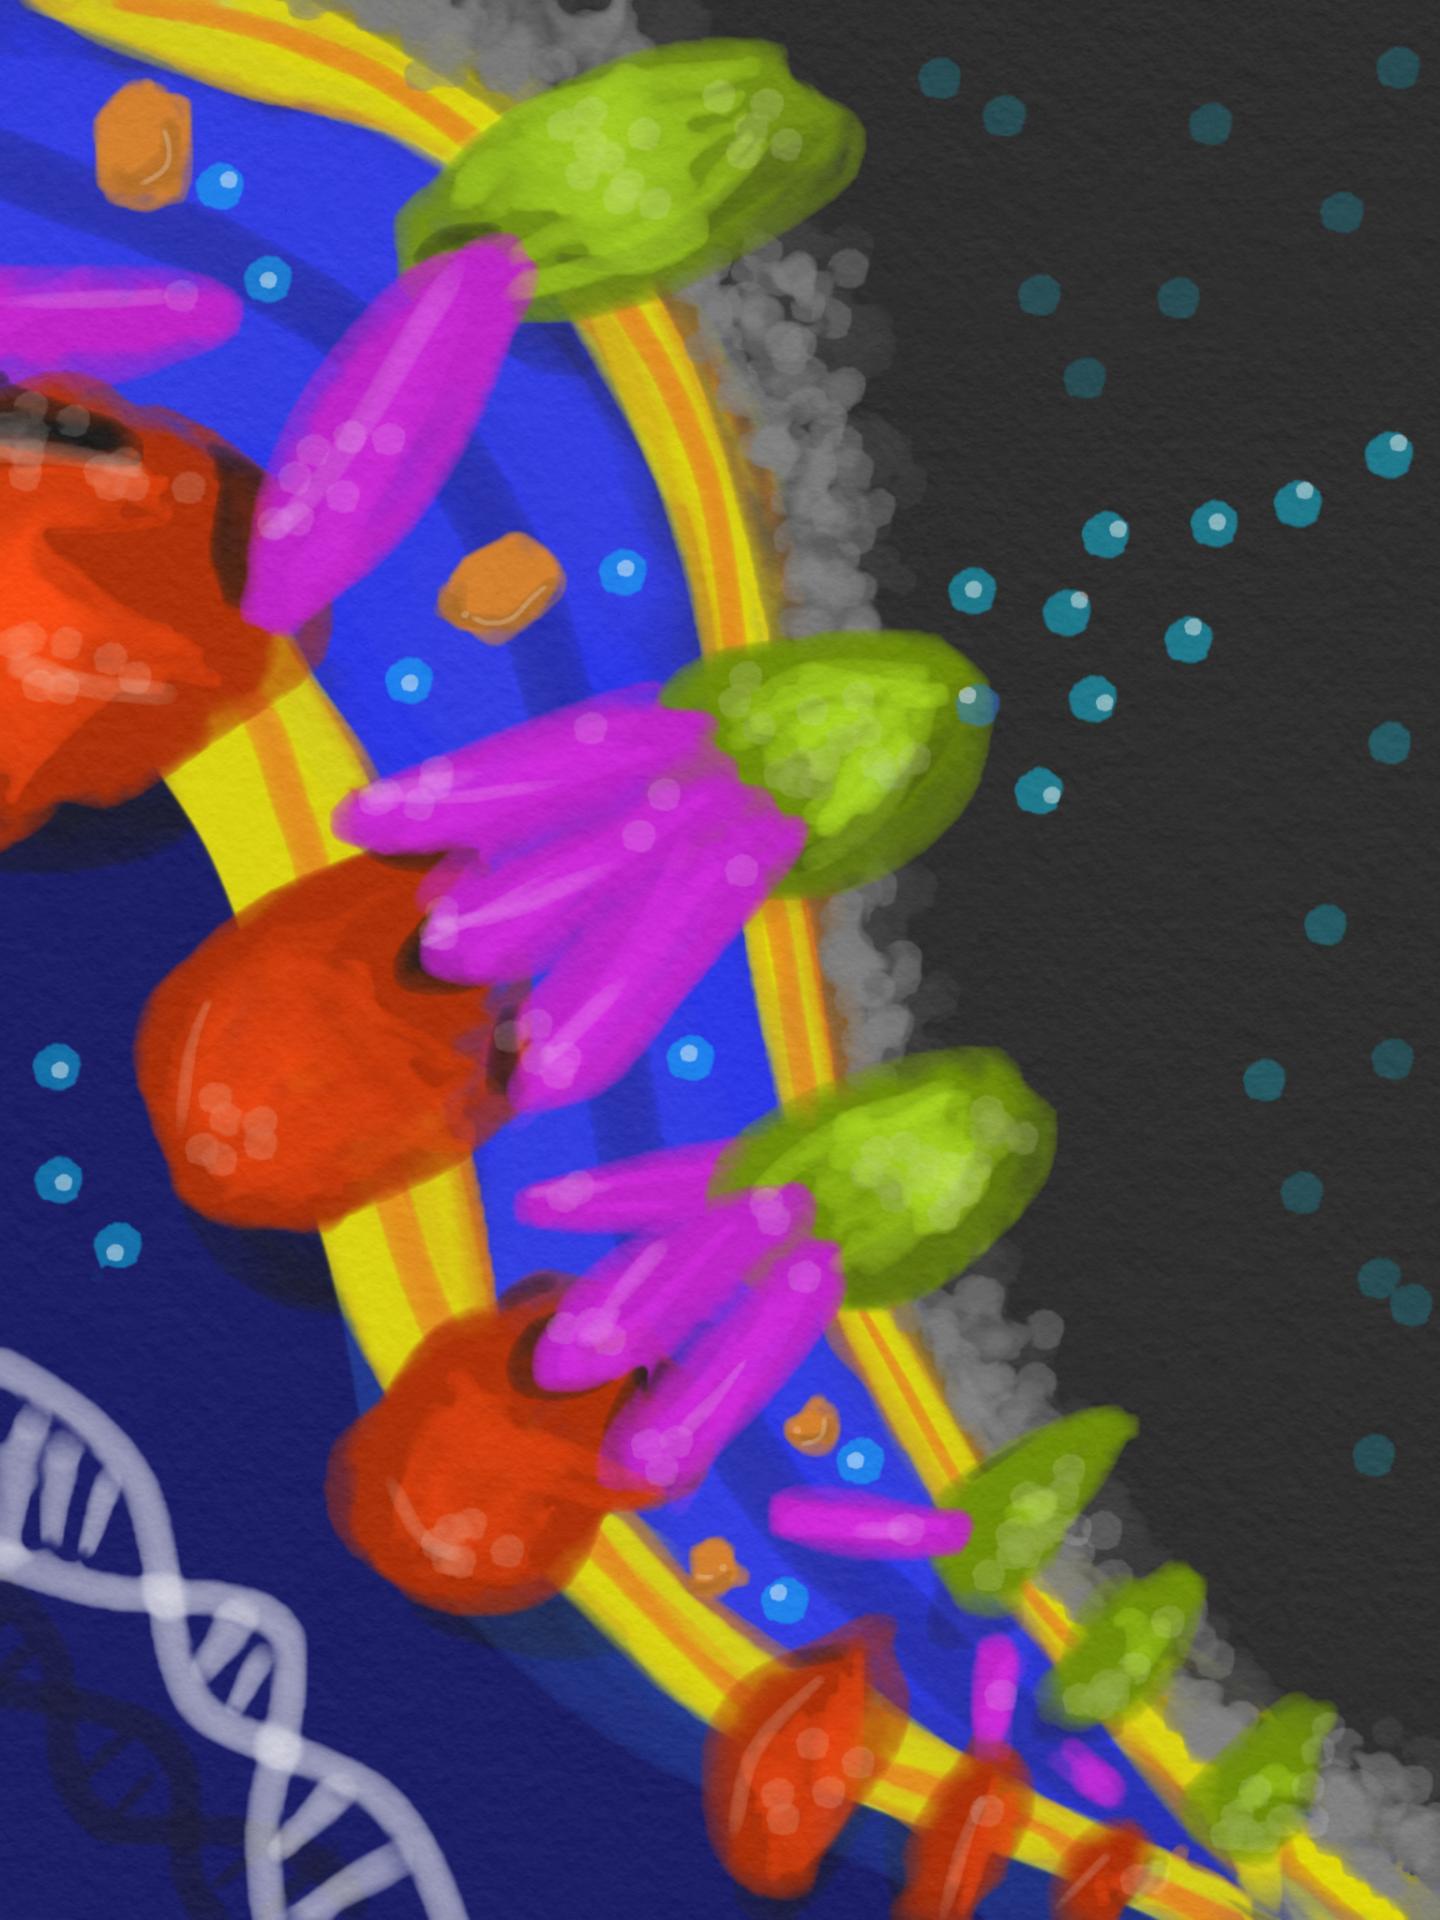 E. coli Bacteria's Defense Secret Revealed